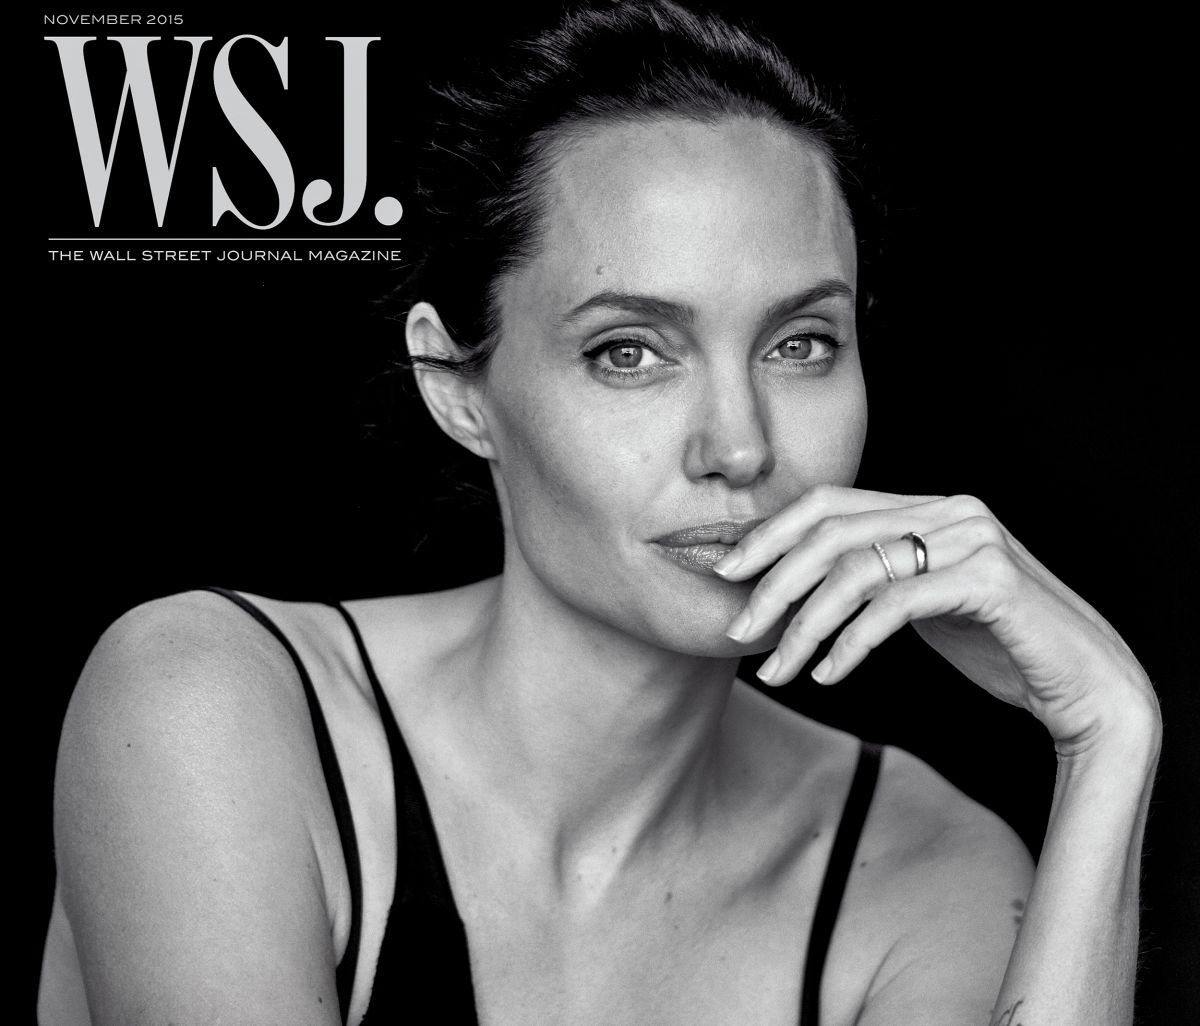 Анджелина Джоли для WSJ. Magazine